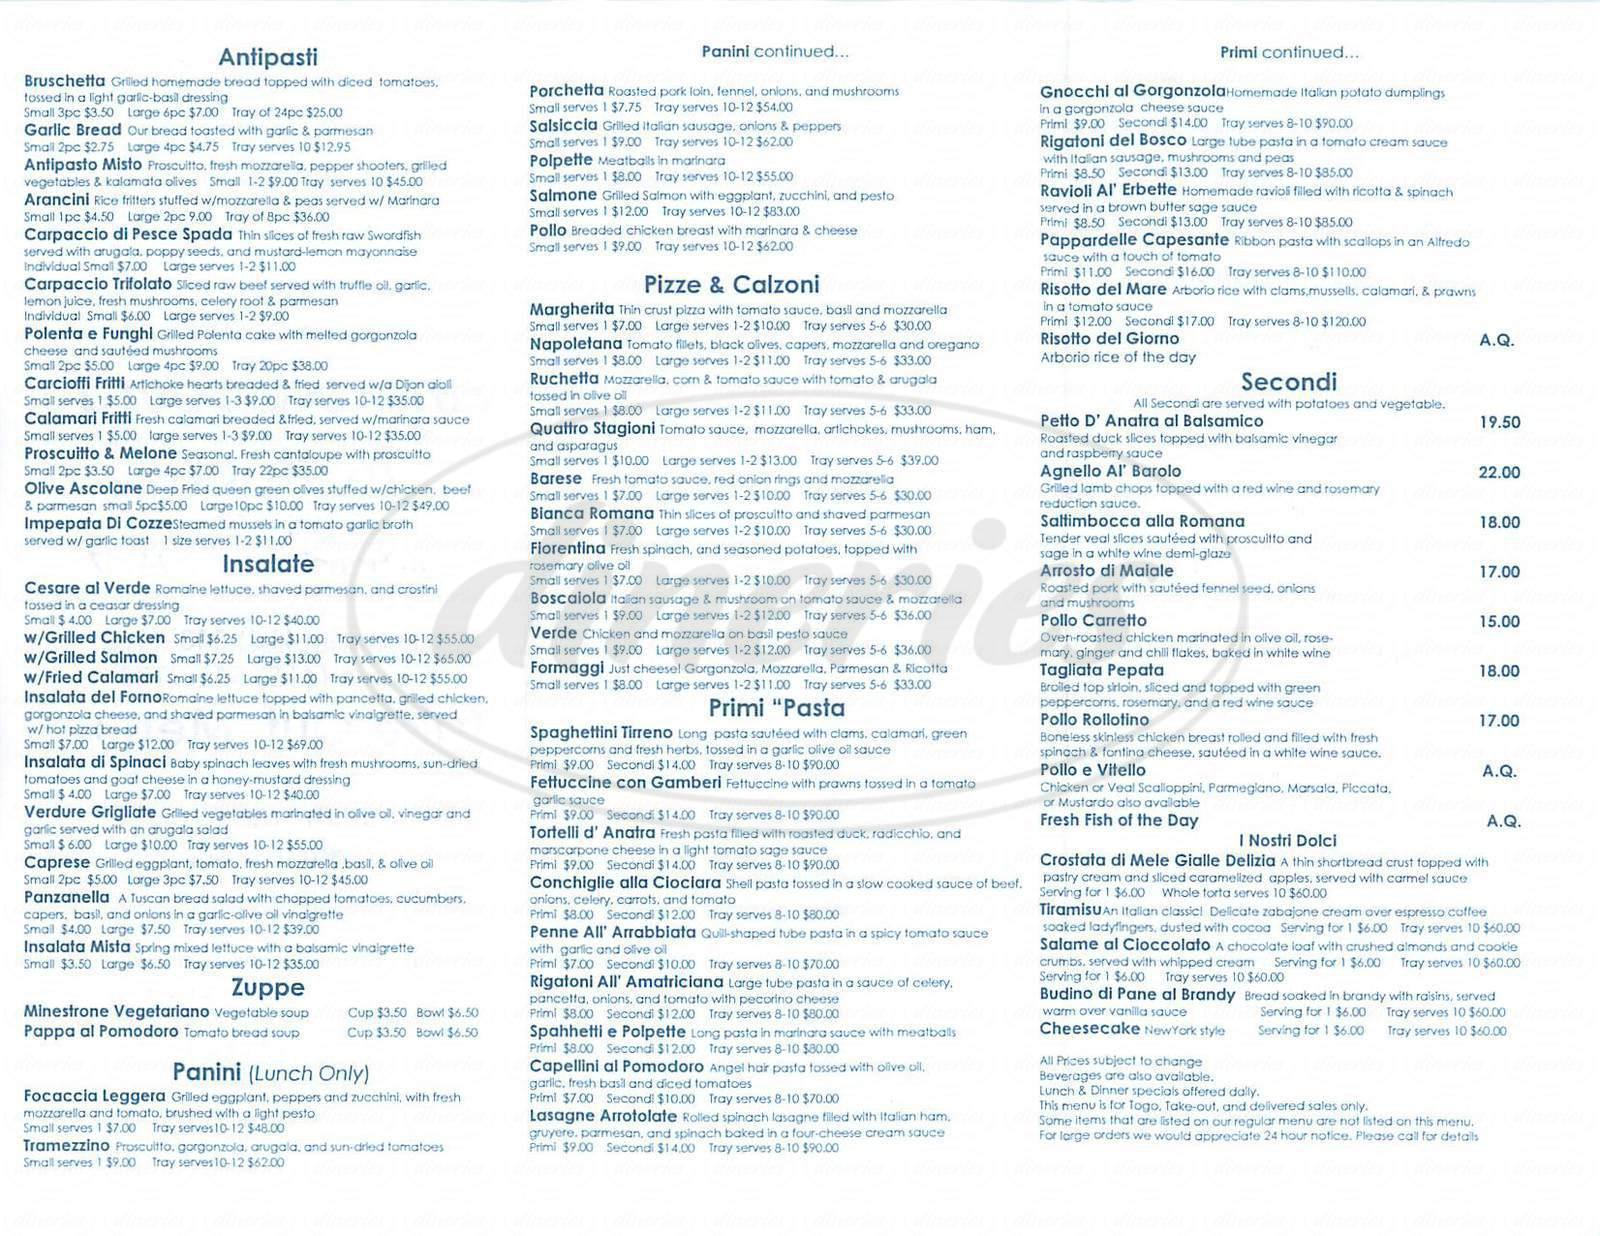 menu for Vino e Cucina Trattoria